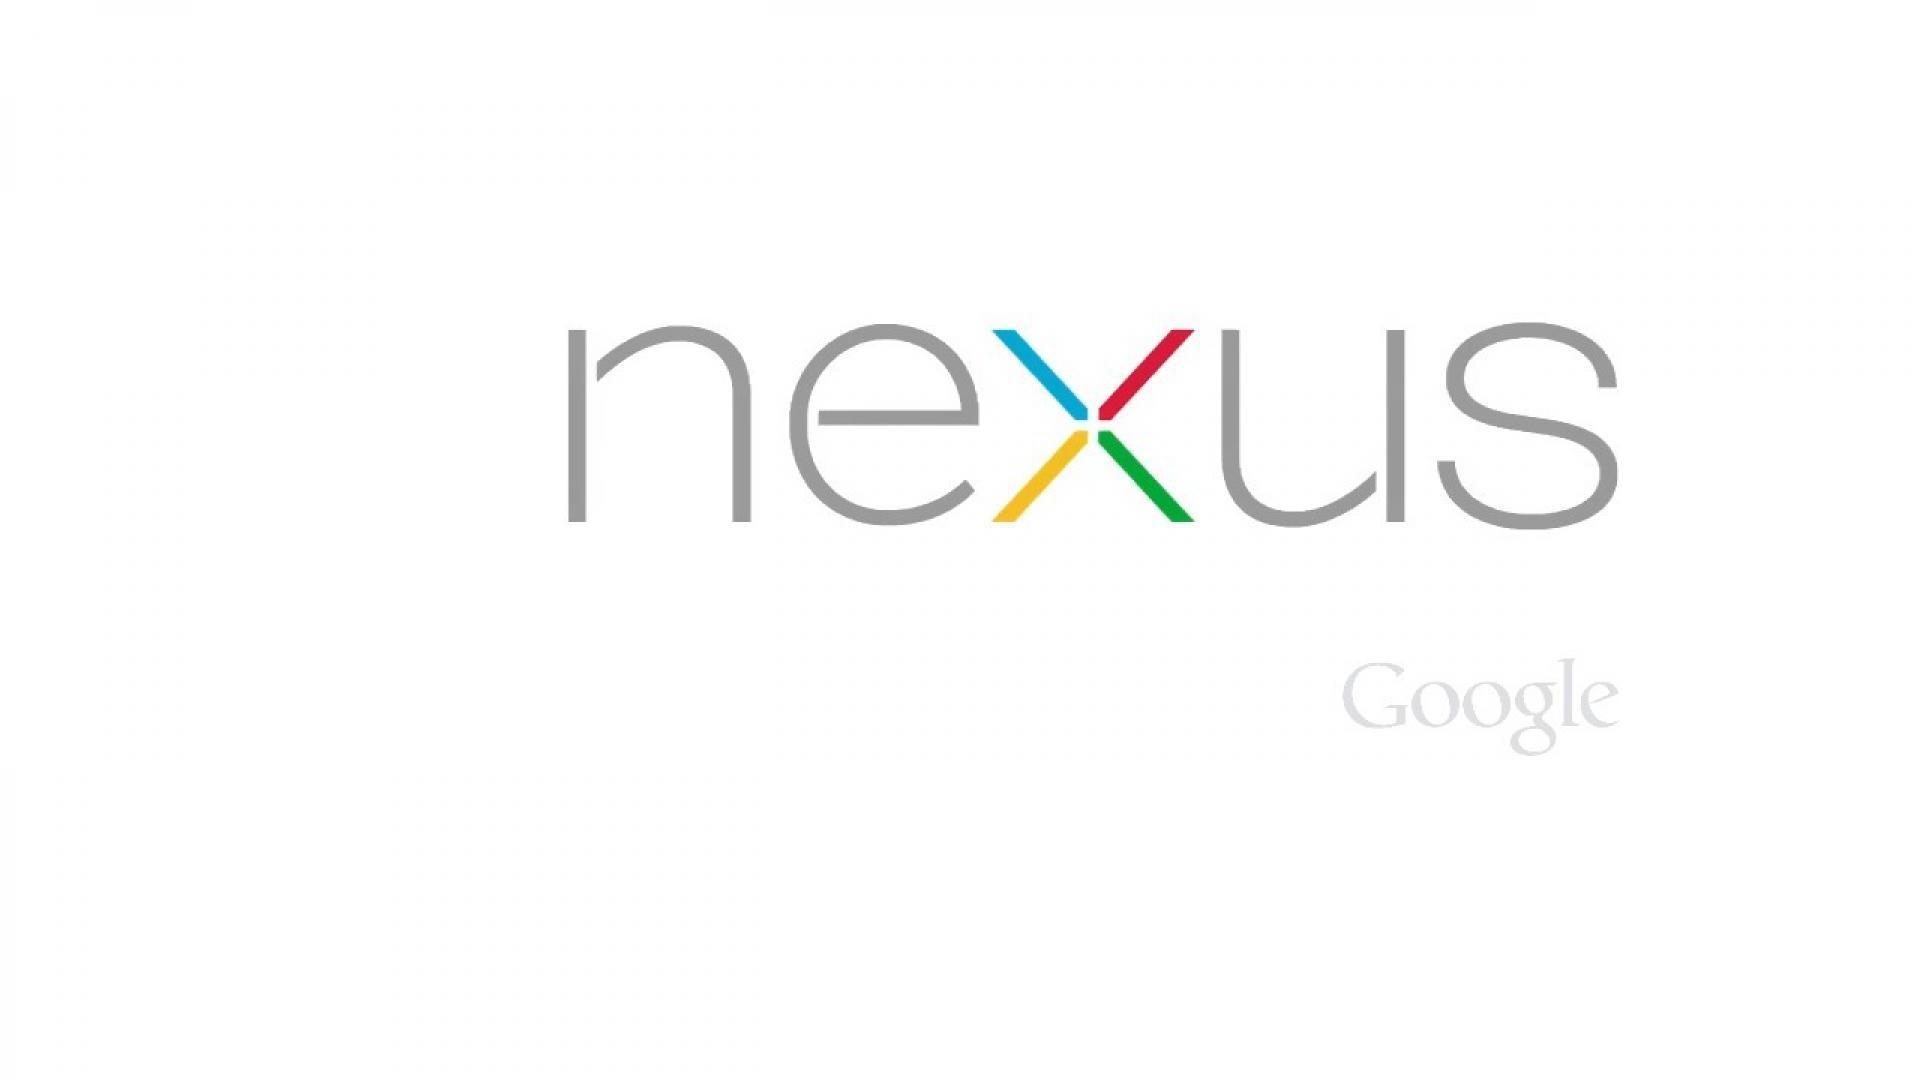 Google logos galaxy nexus tablet wallpaper 11657 1920x1080